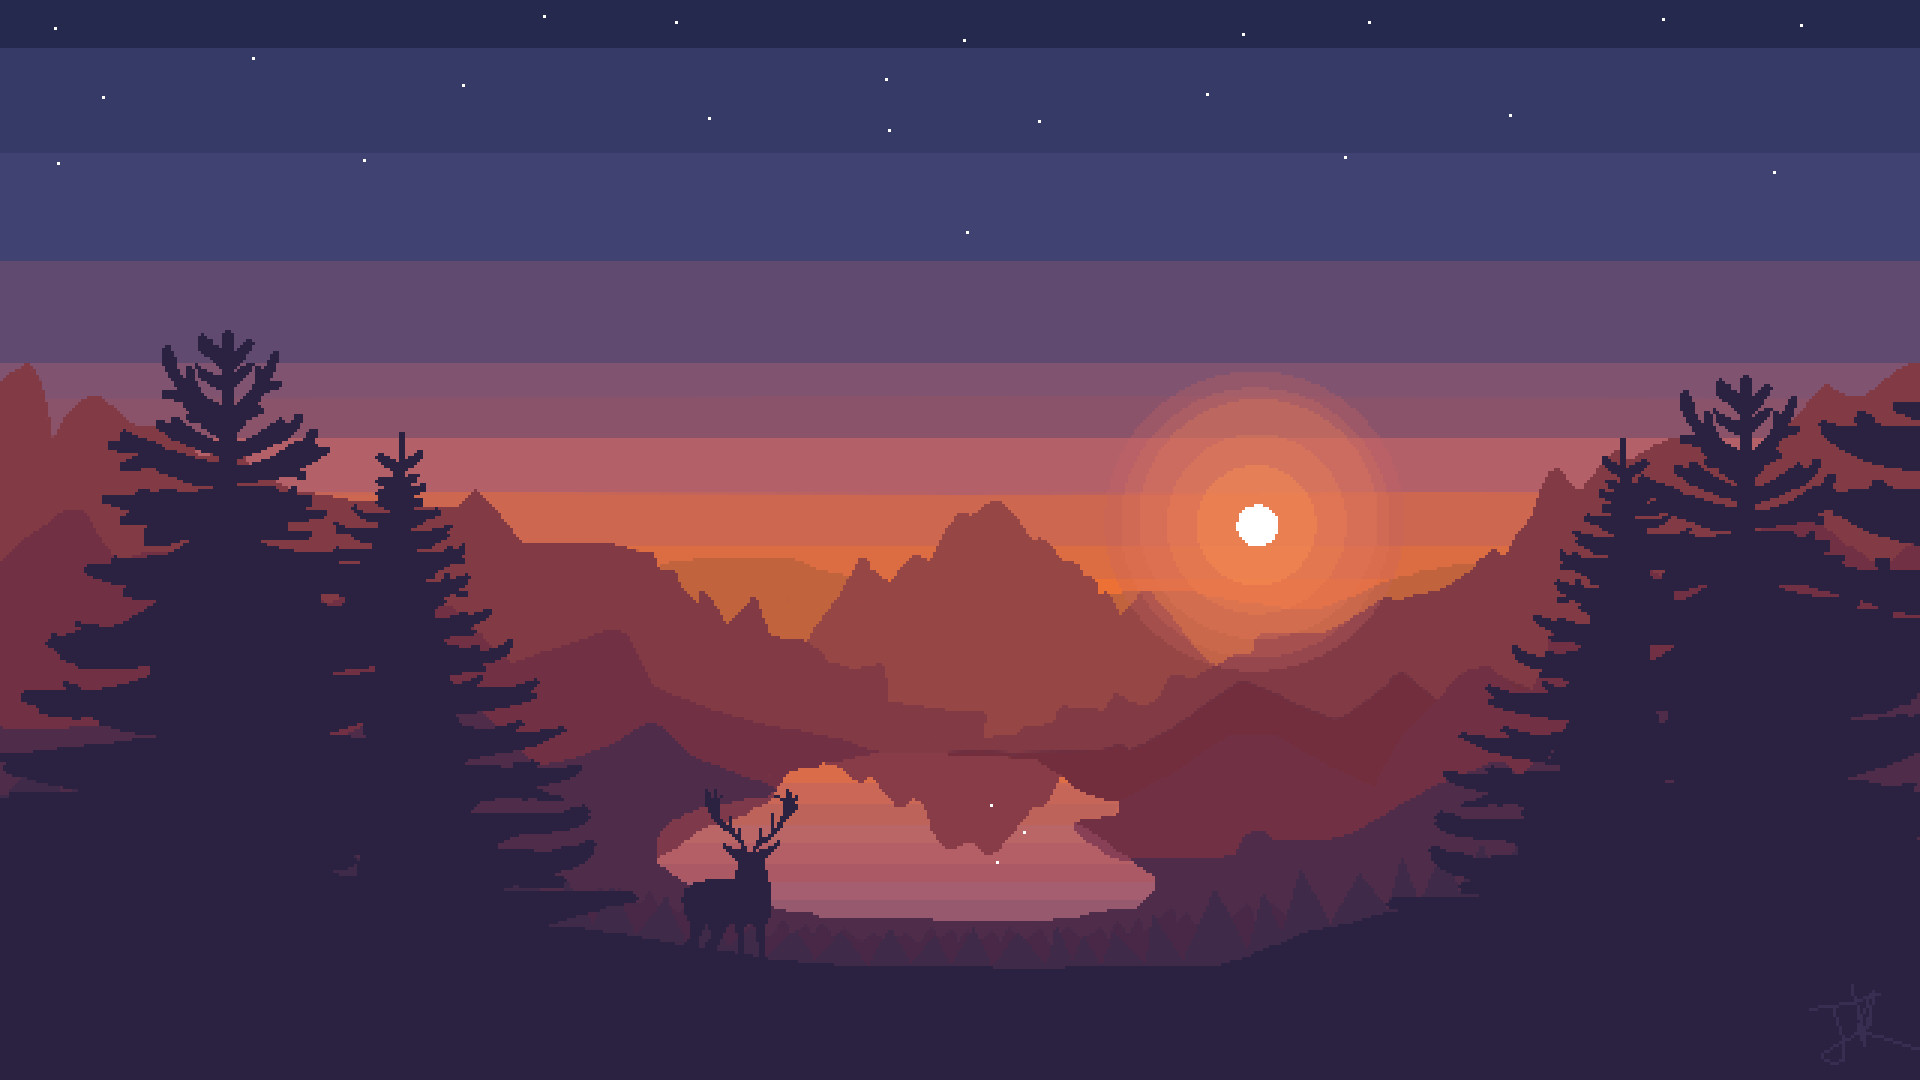 Pixel Art Desktop Wallpaper Posted By Sarah Thompson